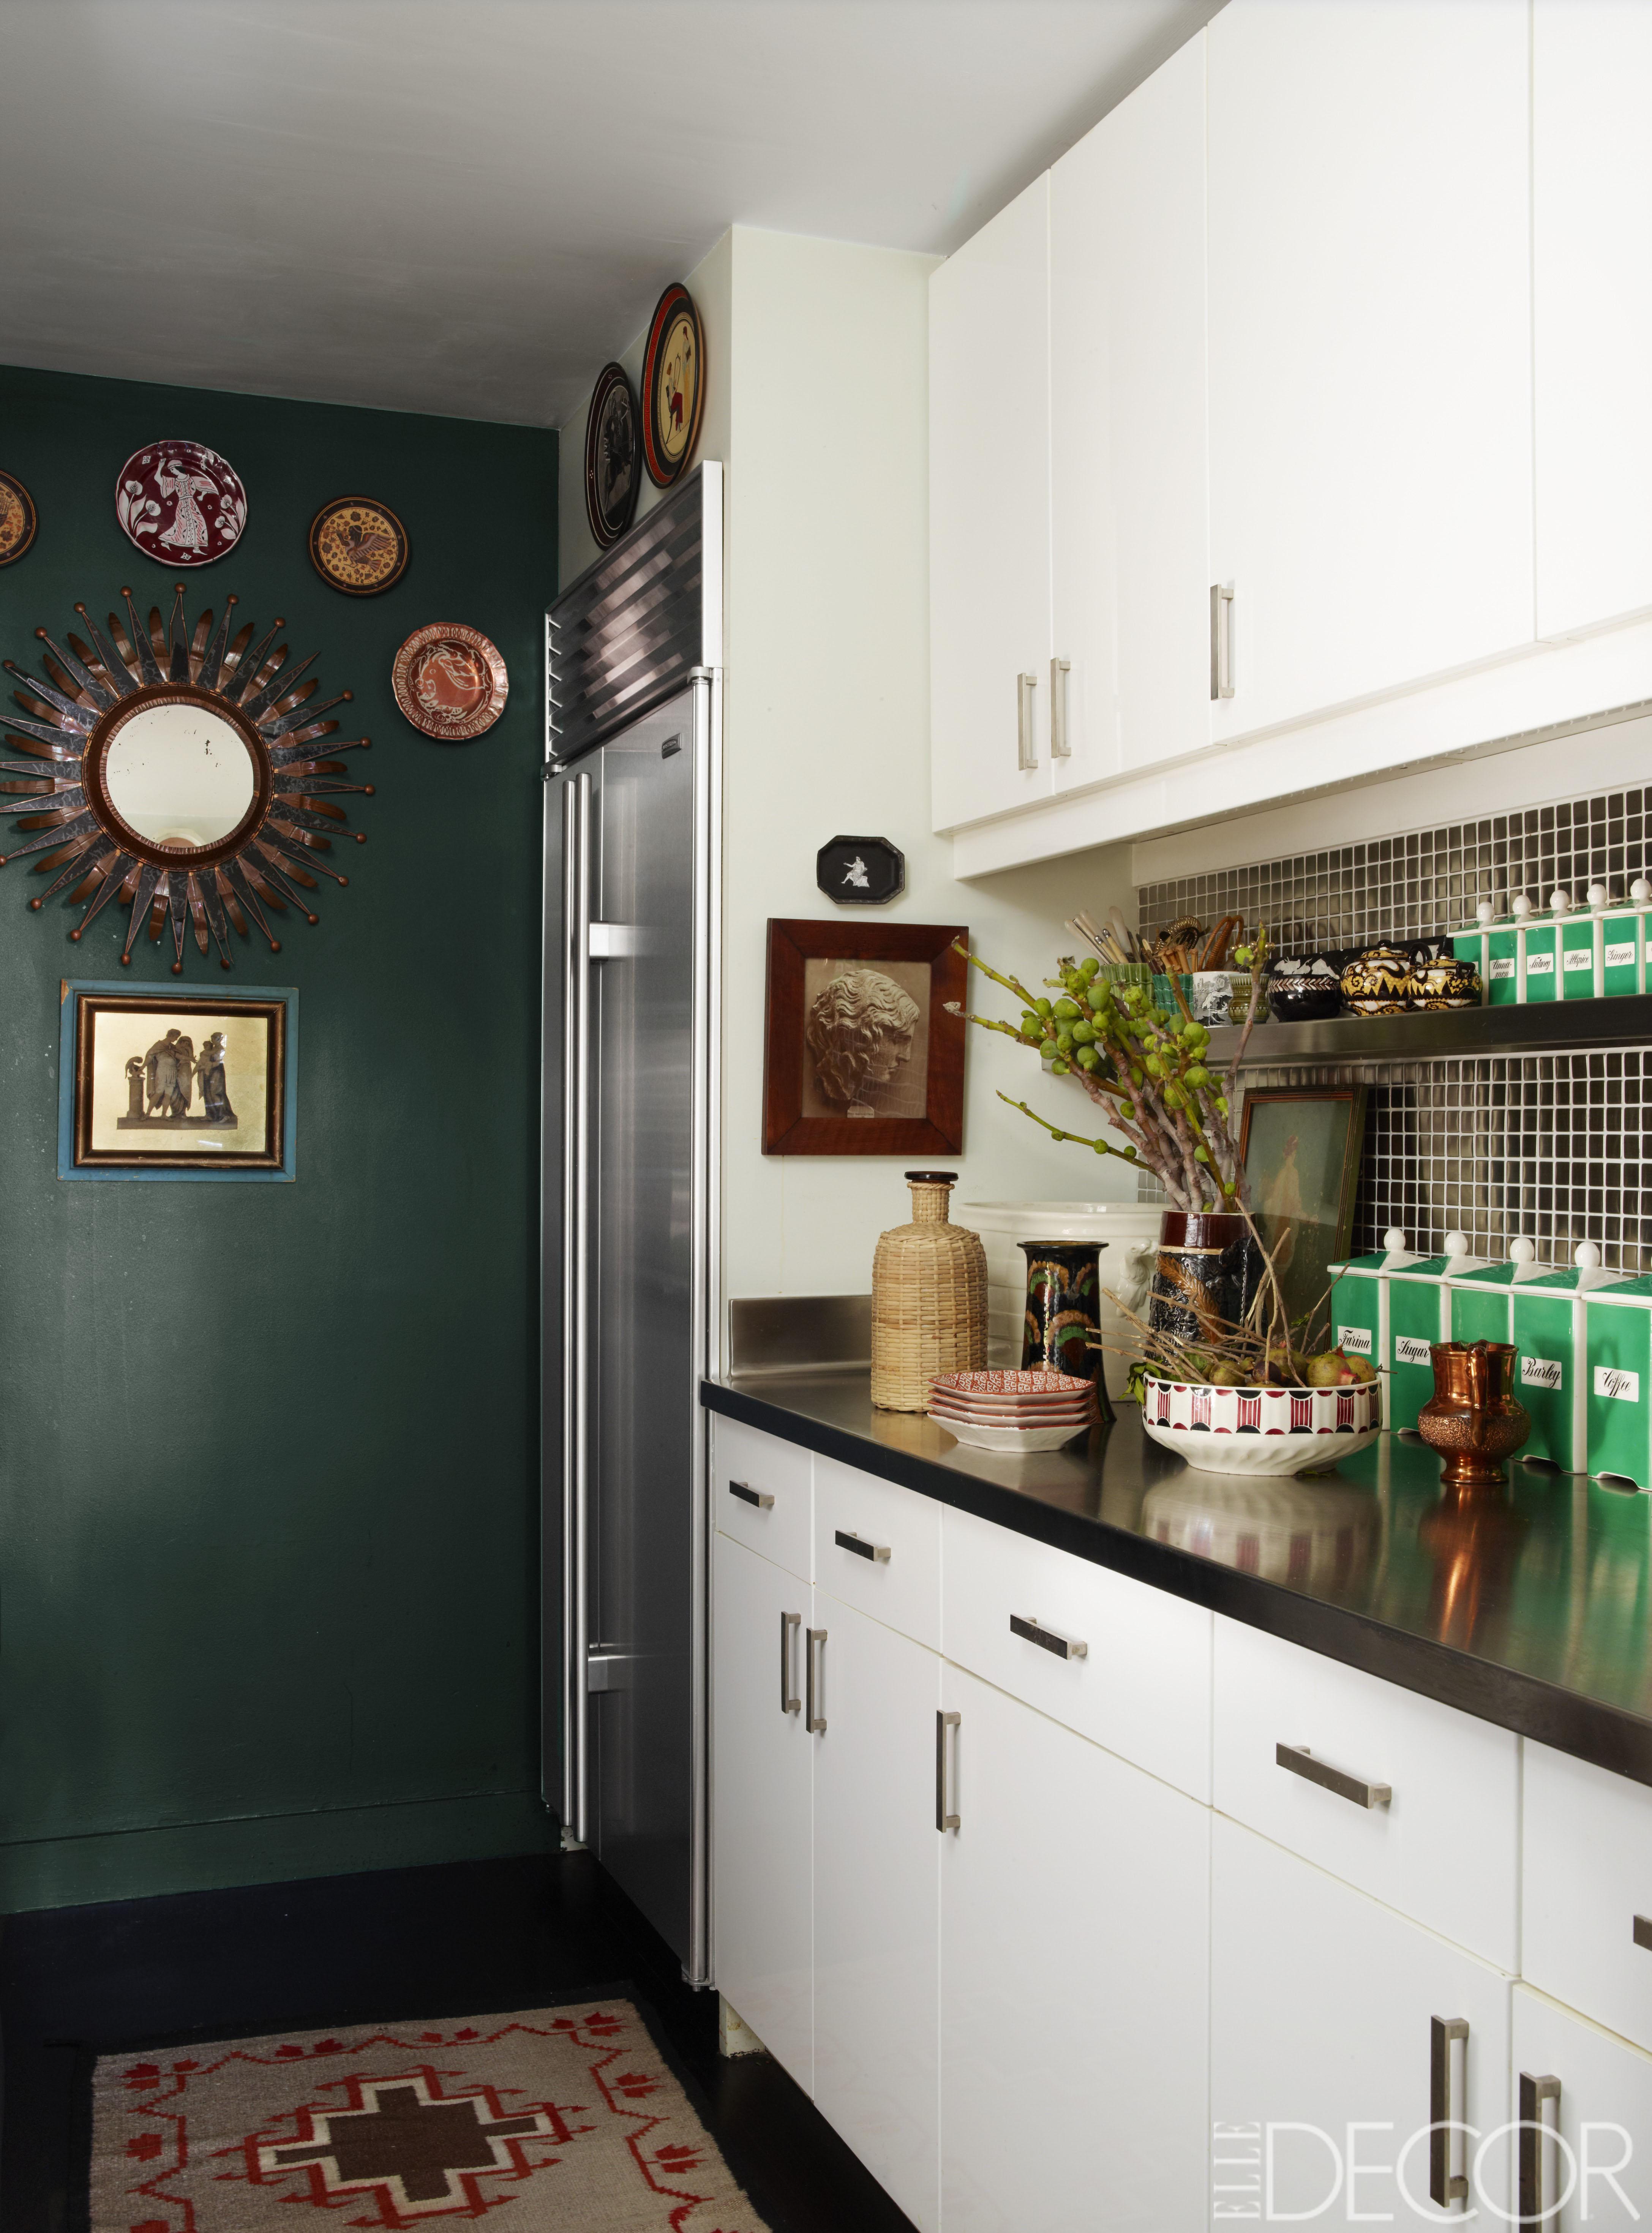 small kitchen designs 50 small kitchen design ideas - decorating tiny kitchens CEQDPXO